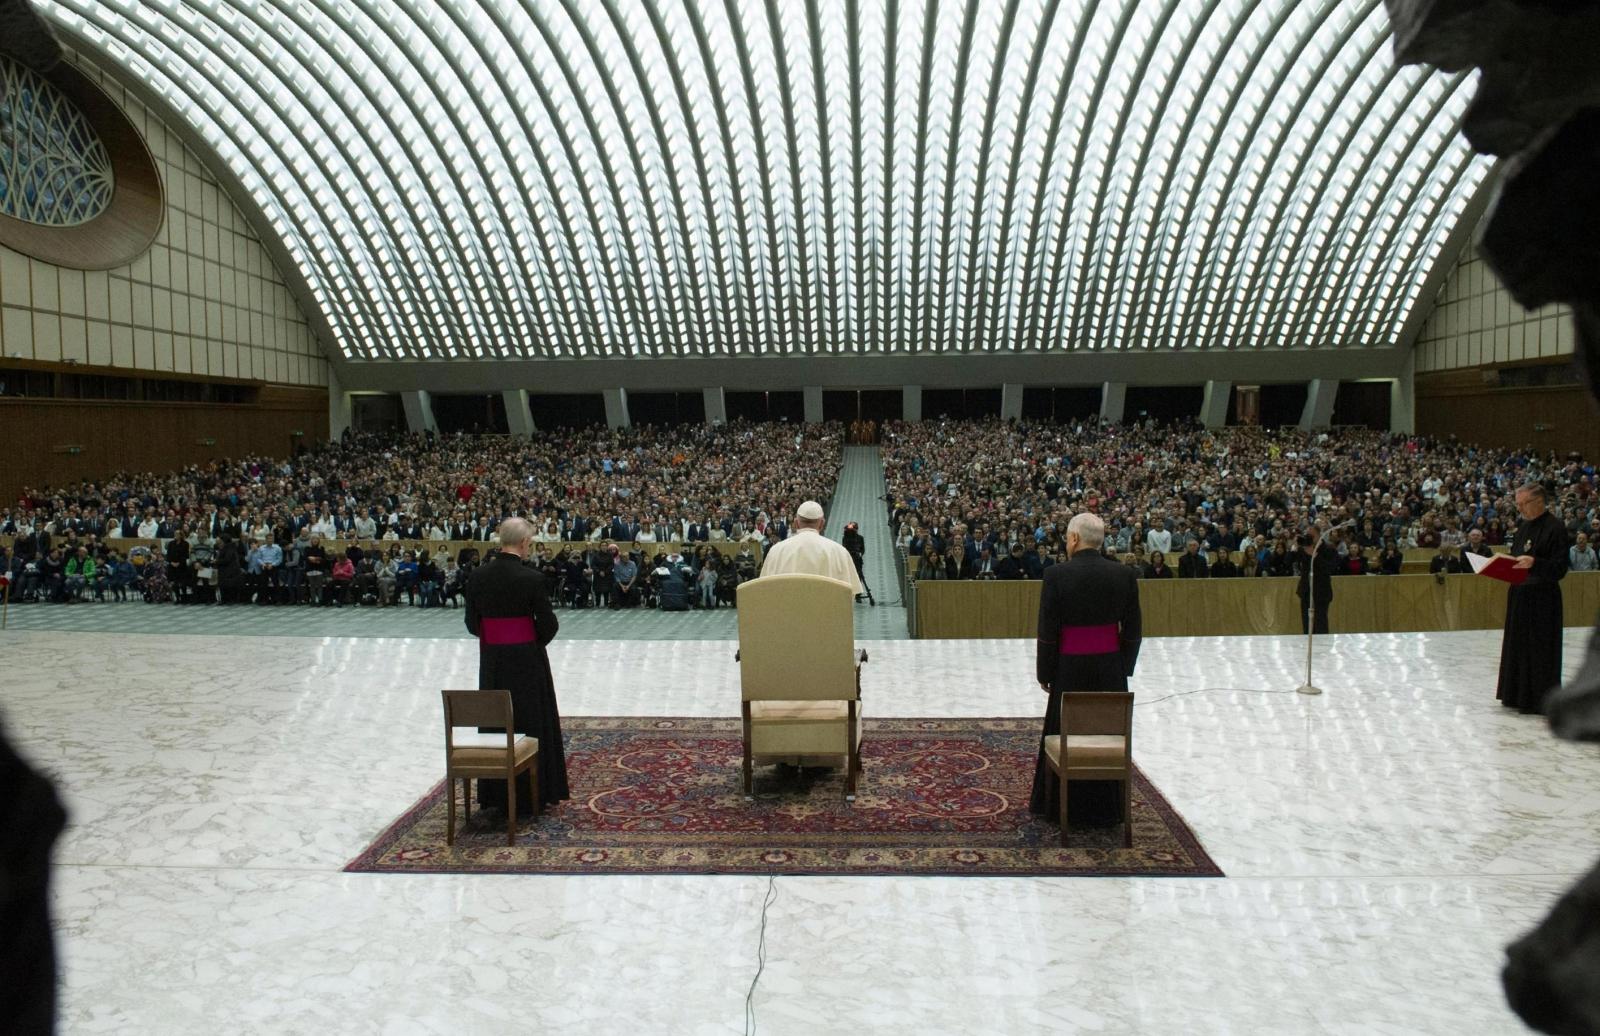 Audiencja generalna w auli Pawła VI. fot. EPA/OSSERVATORE ROMANO